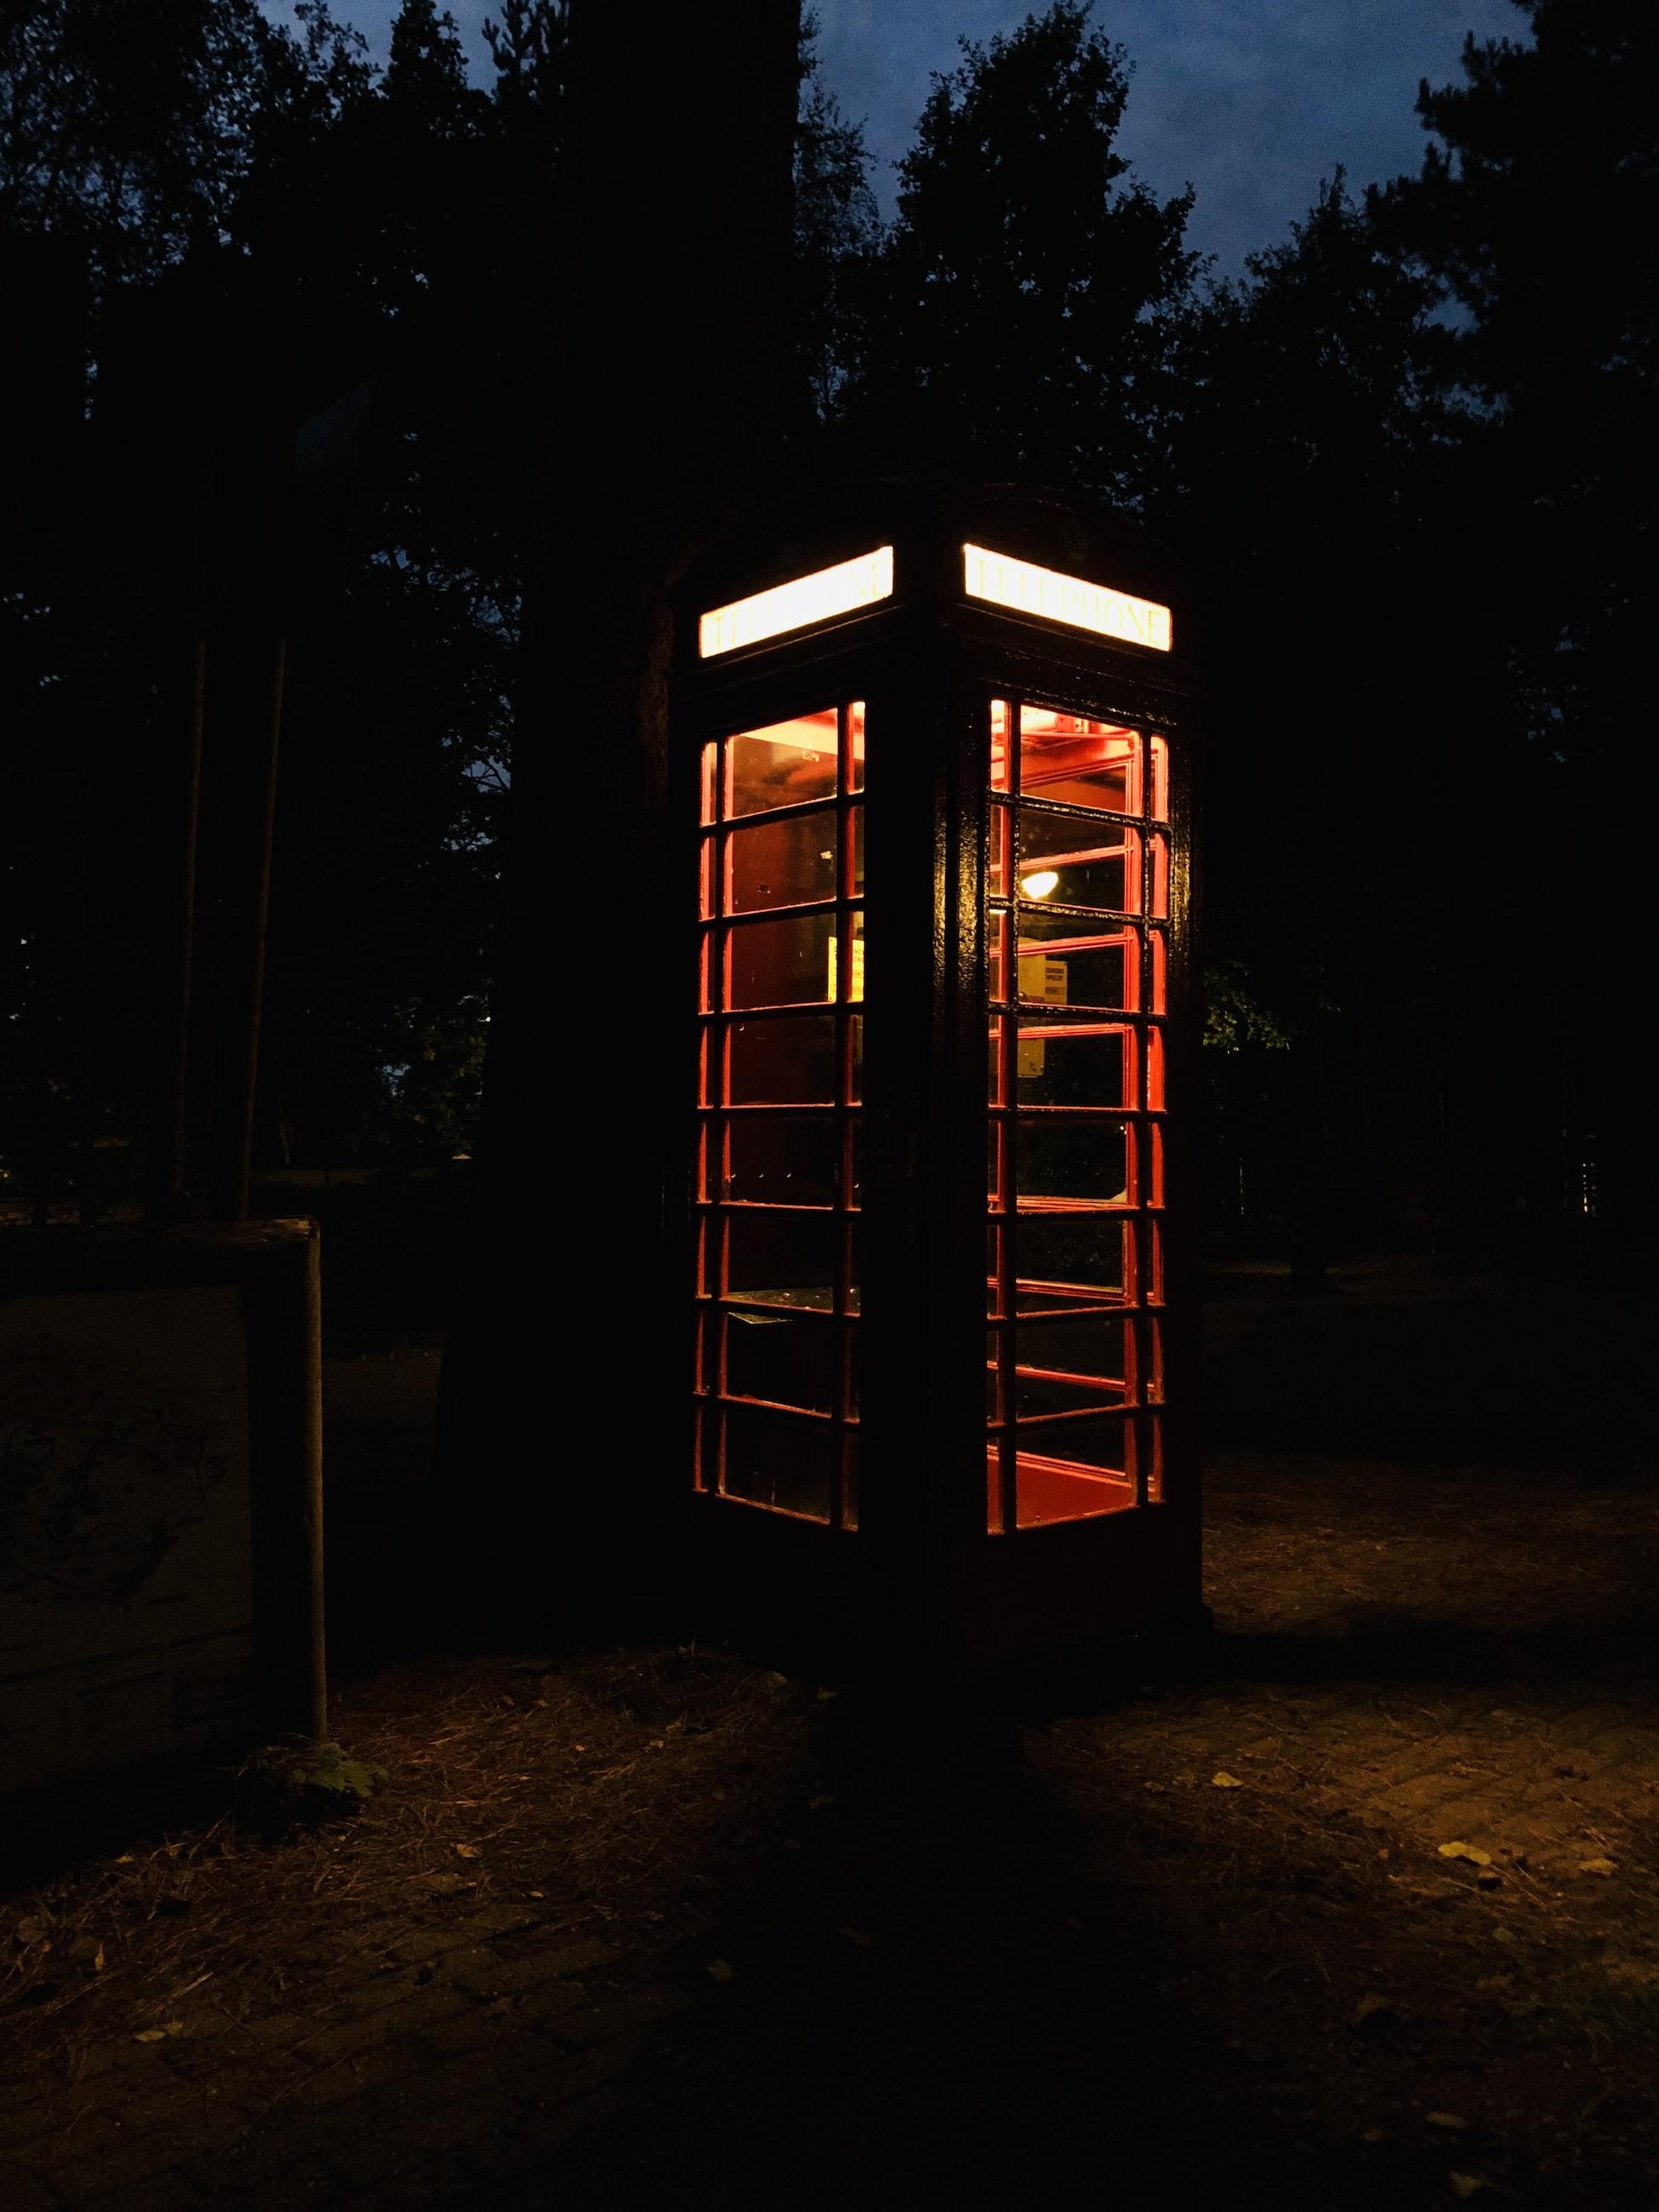 The Phone box